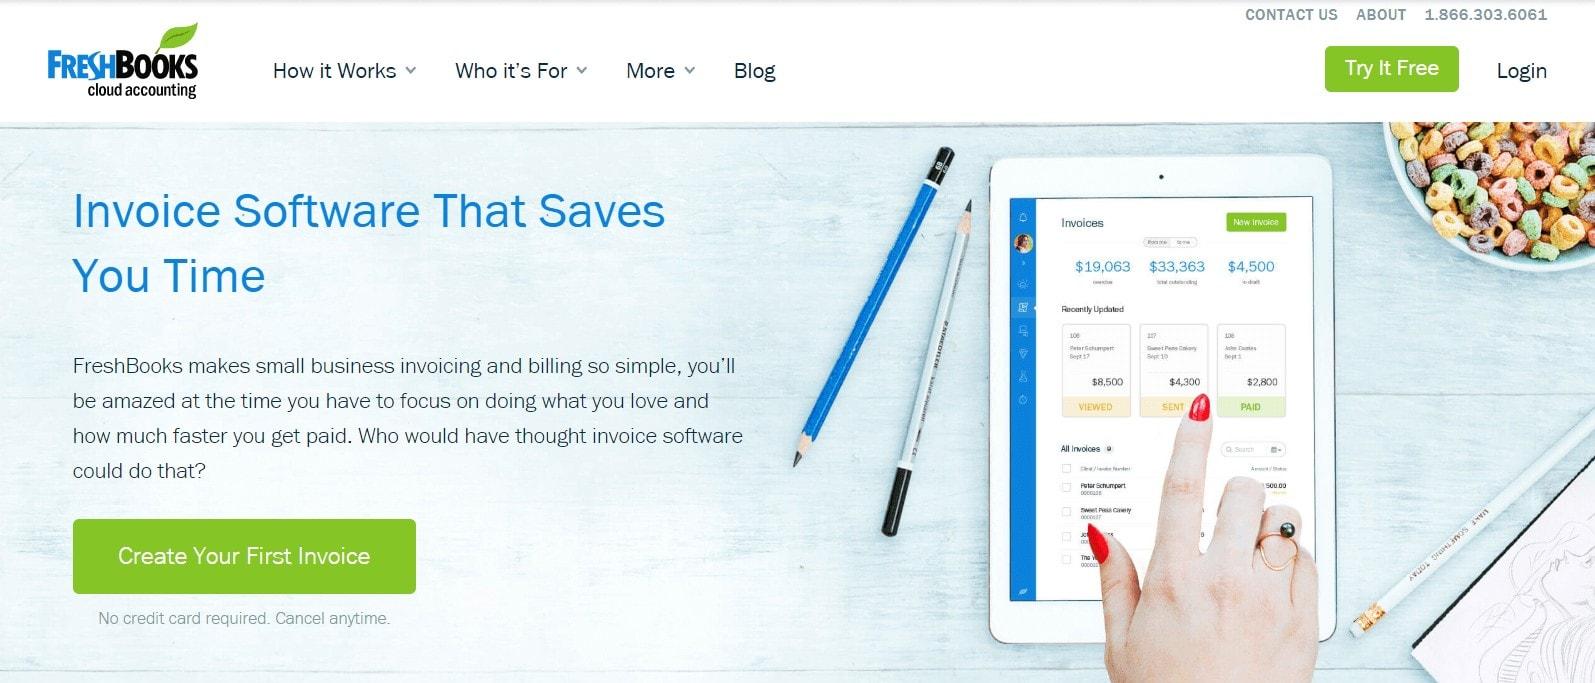 FreshBooks invoicing platform for invoicing